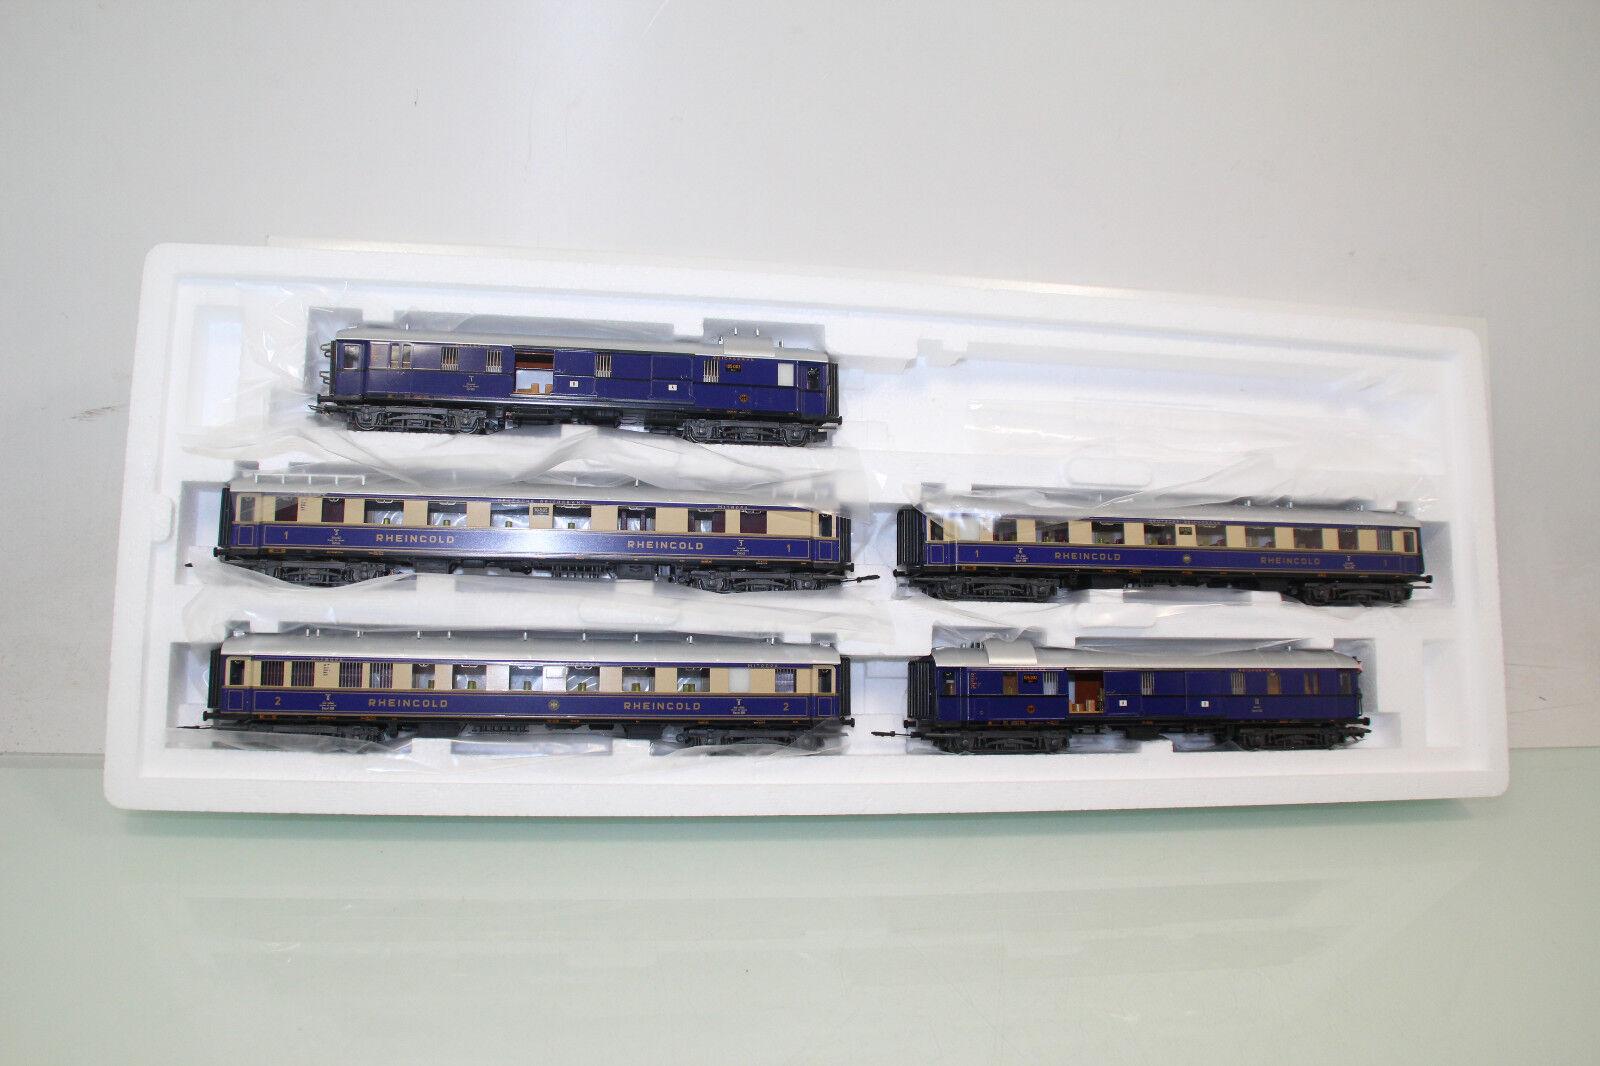 Märklin h0 42283 vagoni-Set 5tlg.  Rheinoro  della DRG ben tenuto in scatola originale (sl6068)